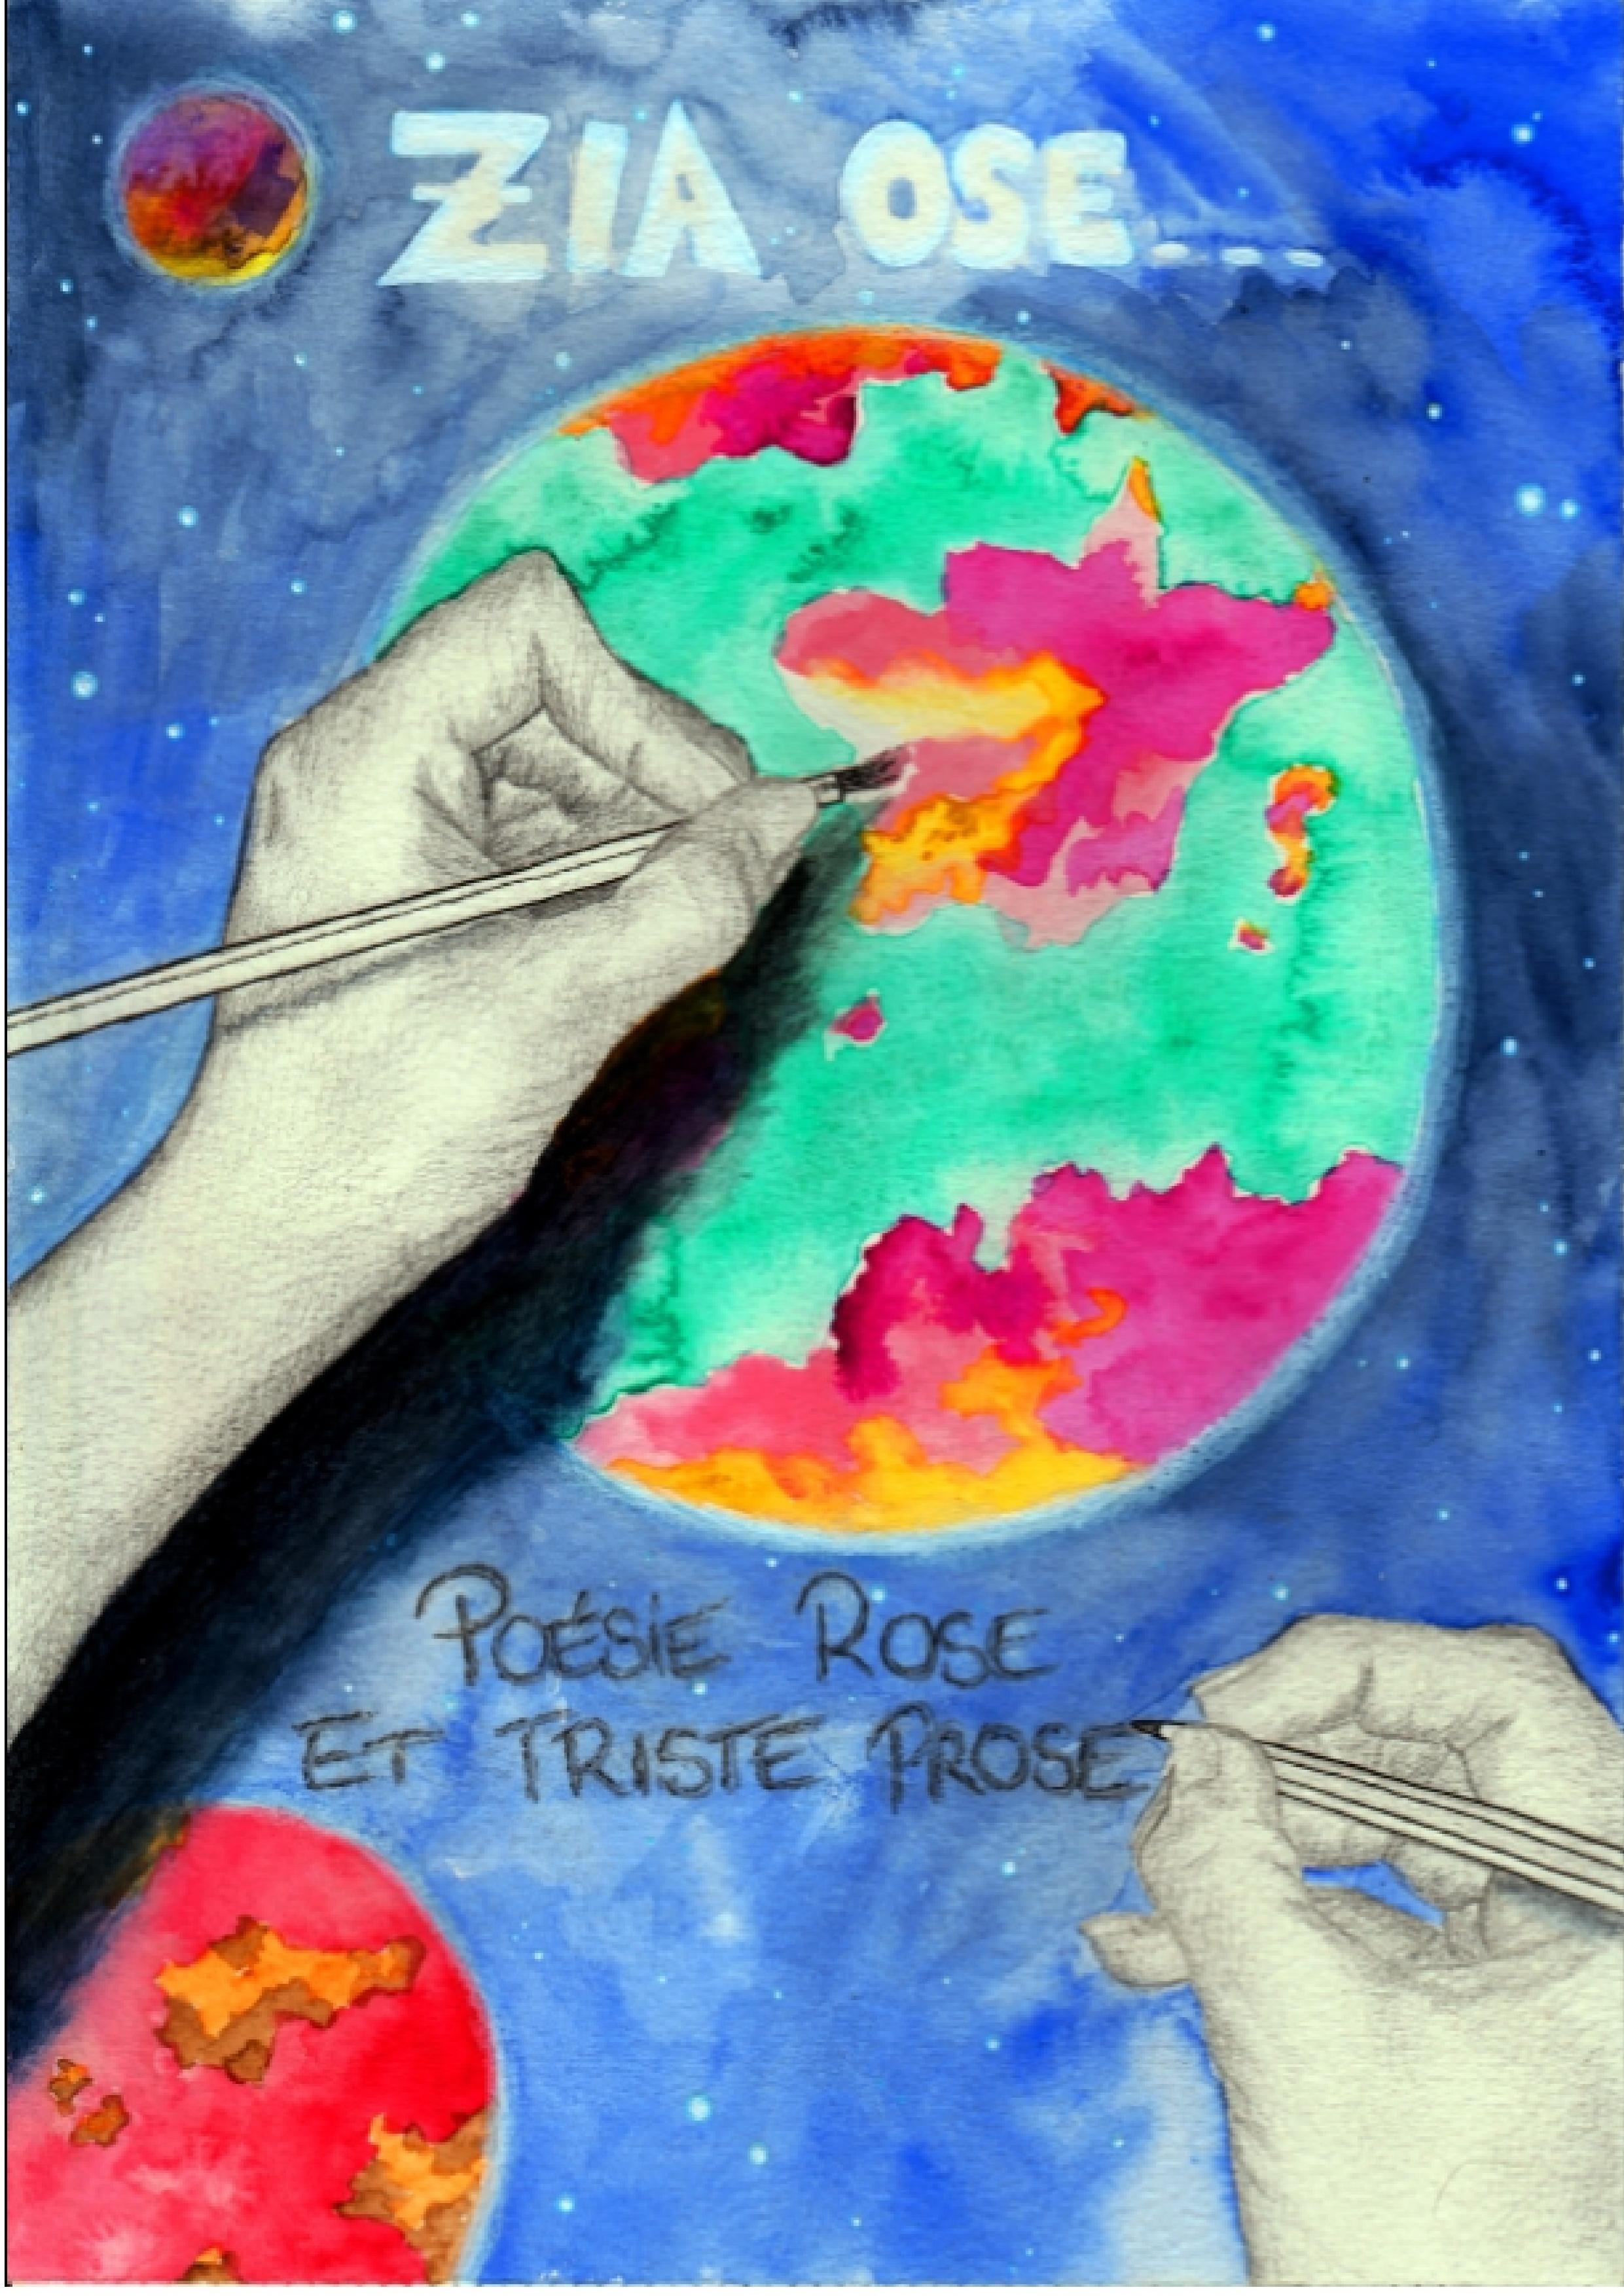 Zia ose : Poésie Rose et Triste Prose